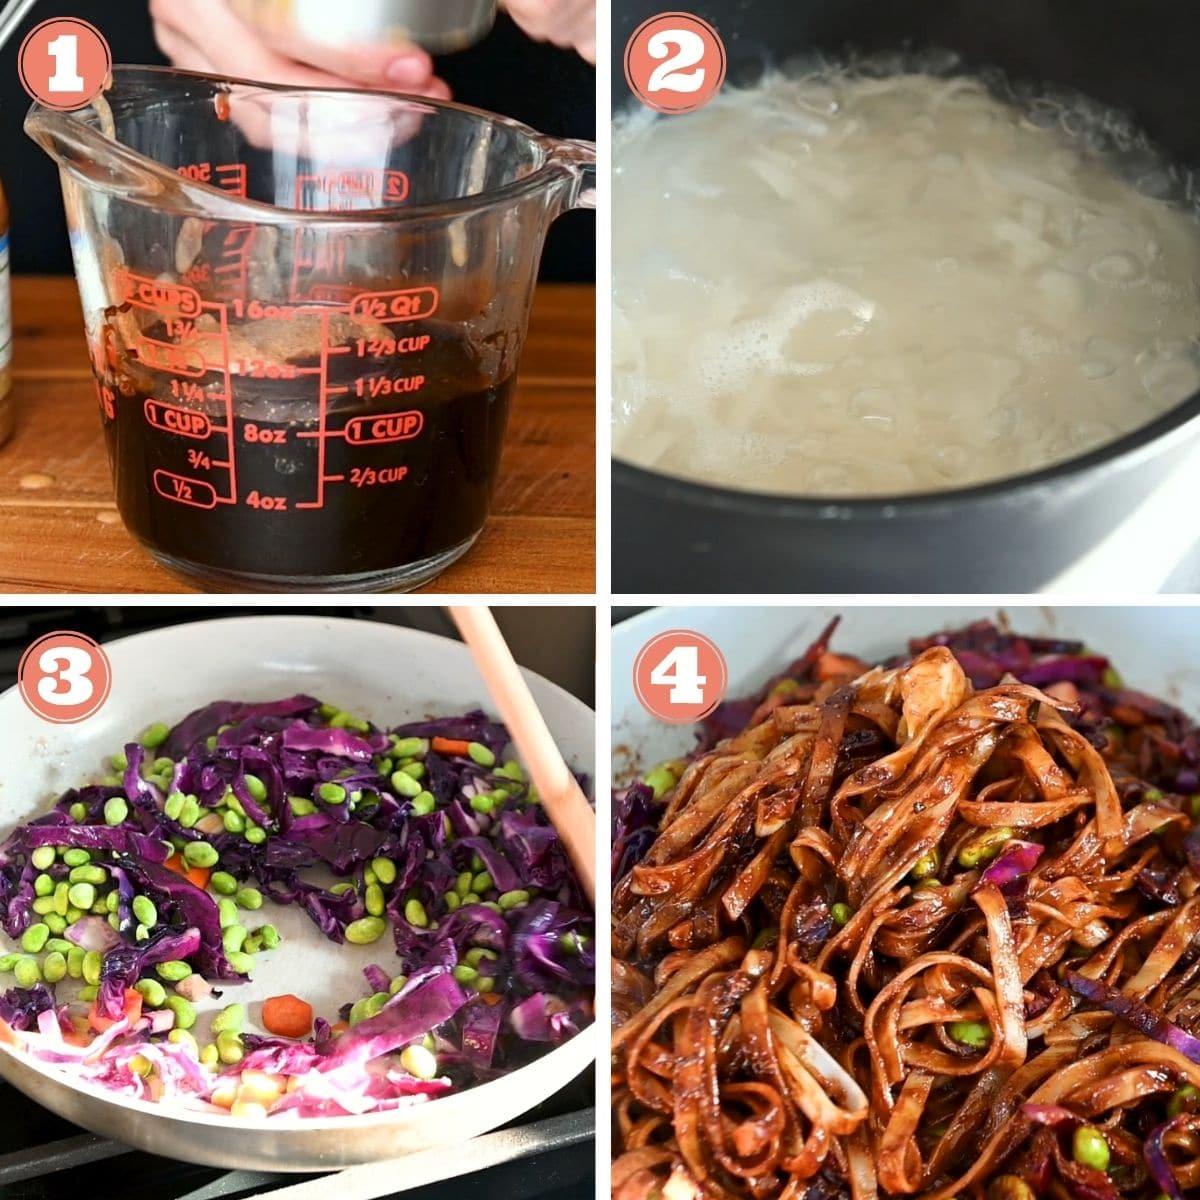 Steps 1 through 4 to make almond butter stir fry